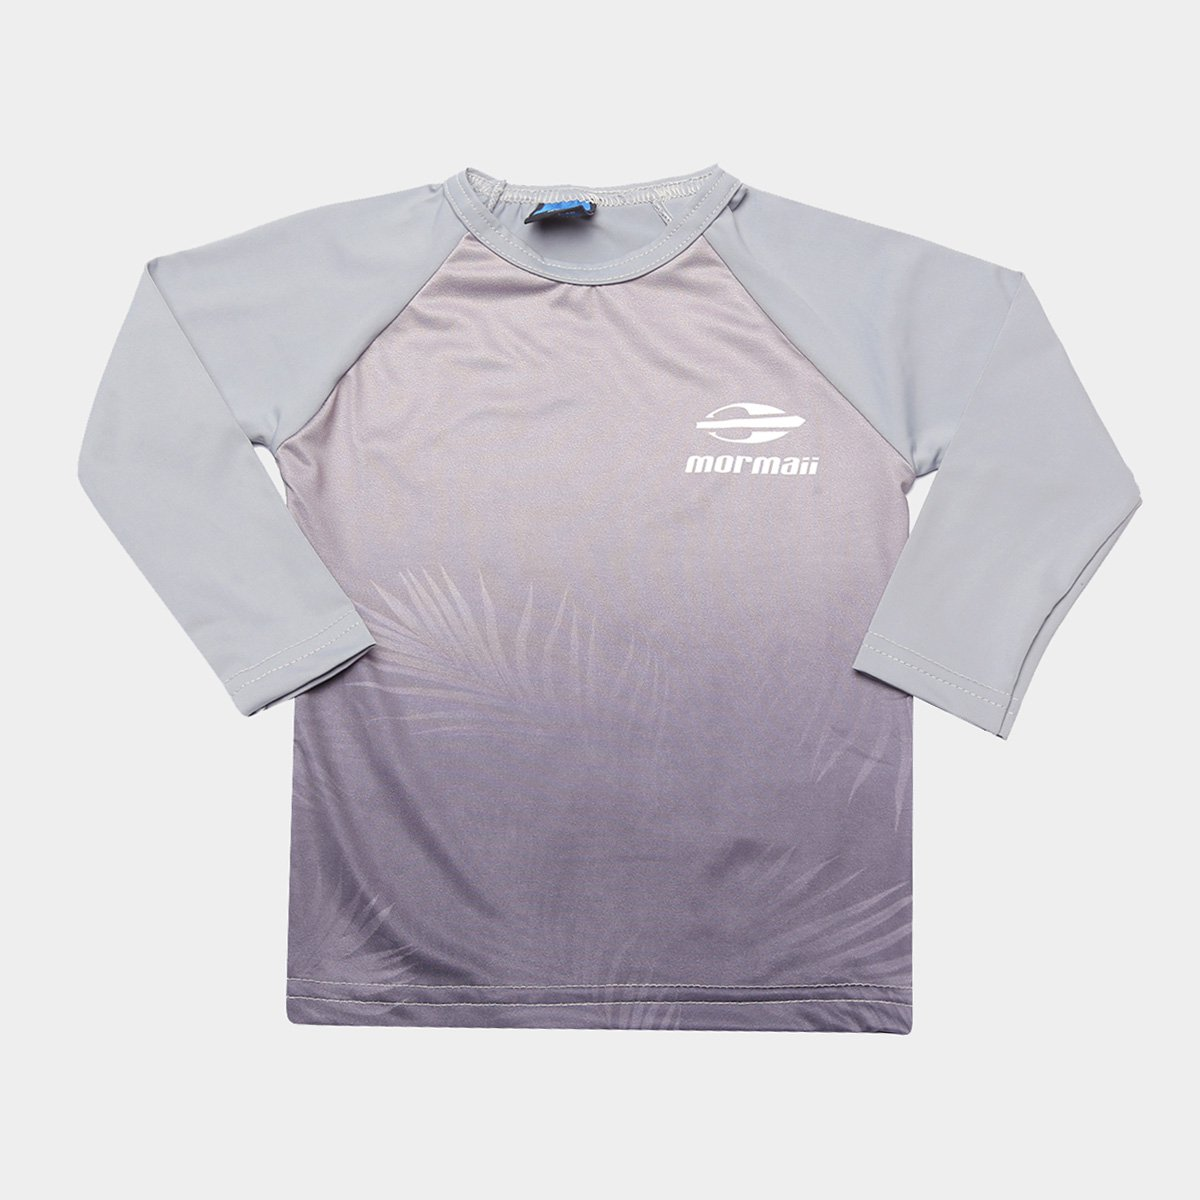 Camiseta Infantil Mormaii Estampada Manga Longa Masculina